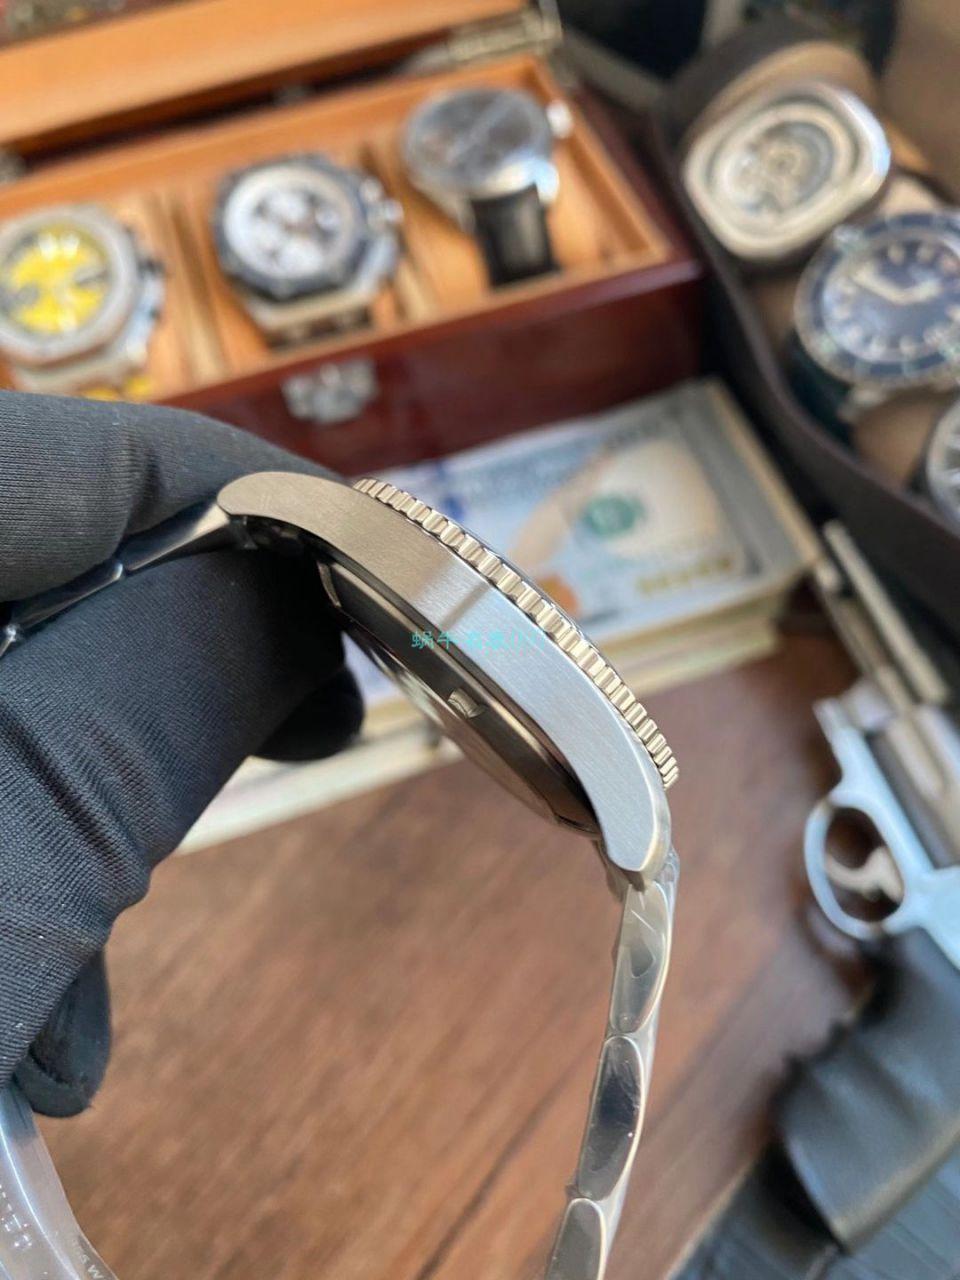 ZF厂浪琴康卡斯一比一顶级复刻手表L3.642.4.56.6腕表 / L171